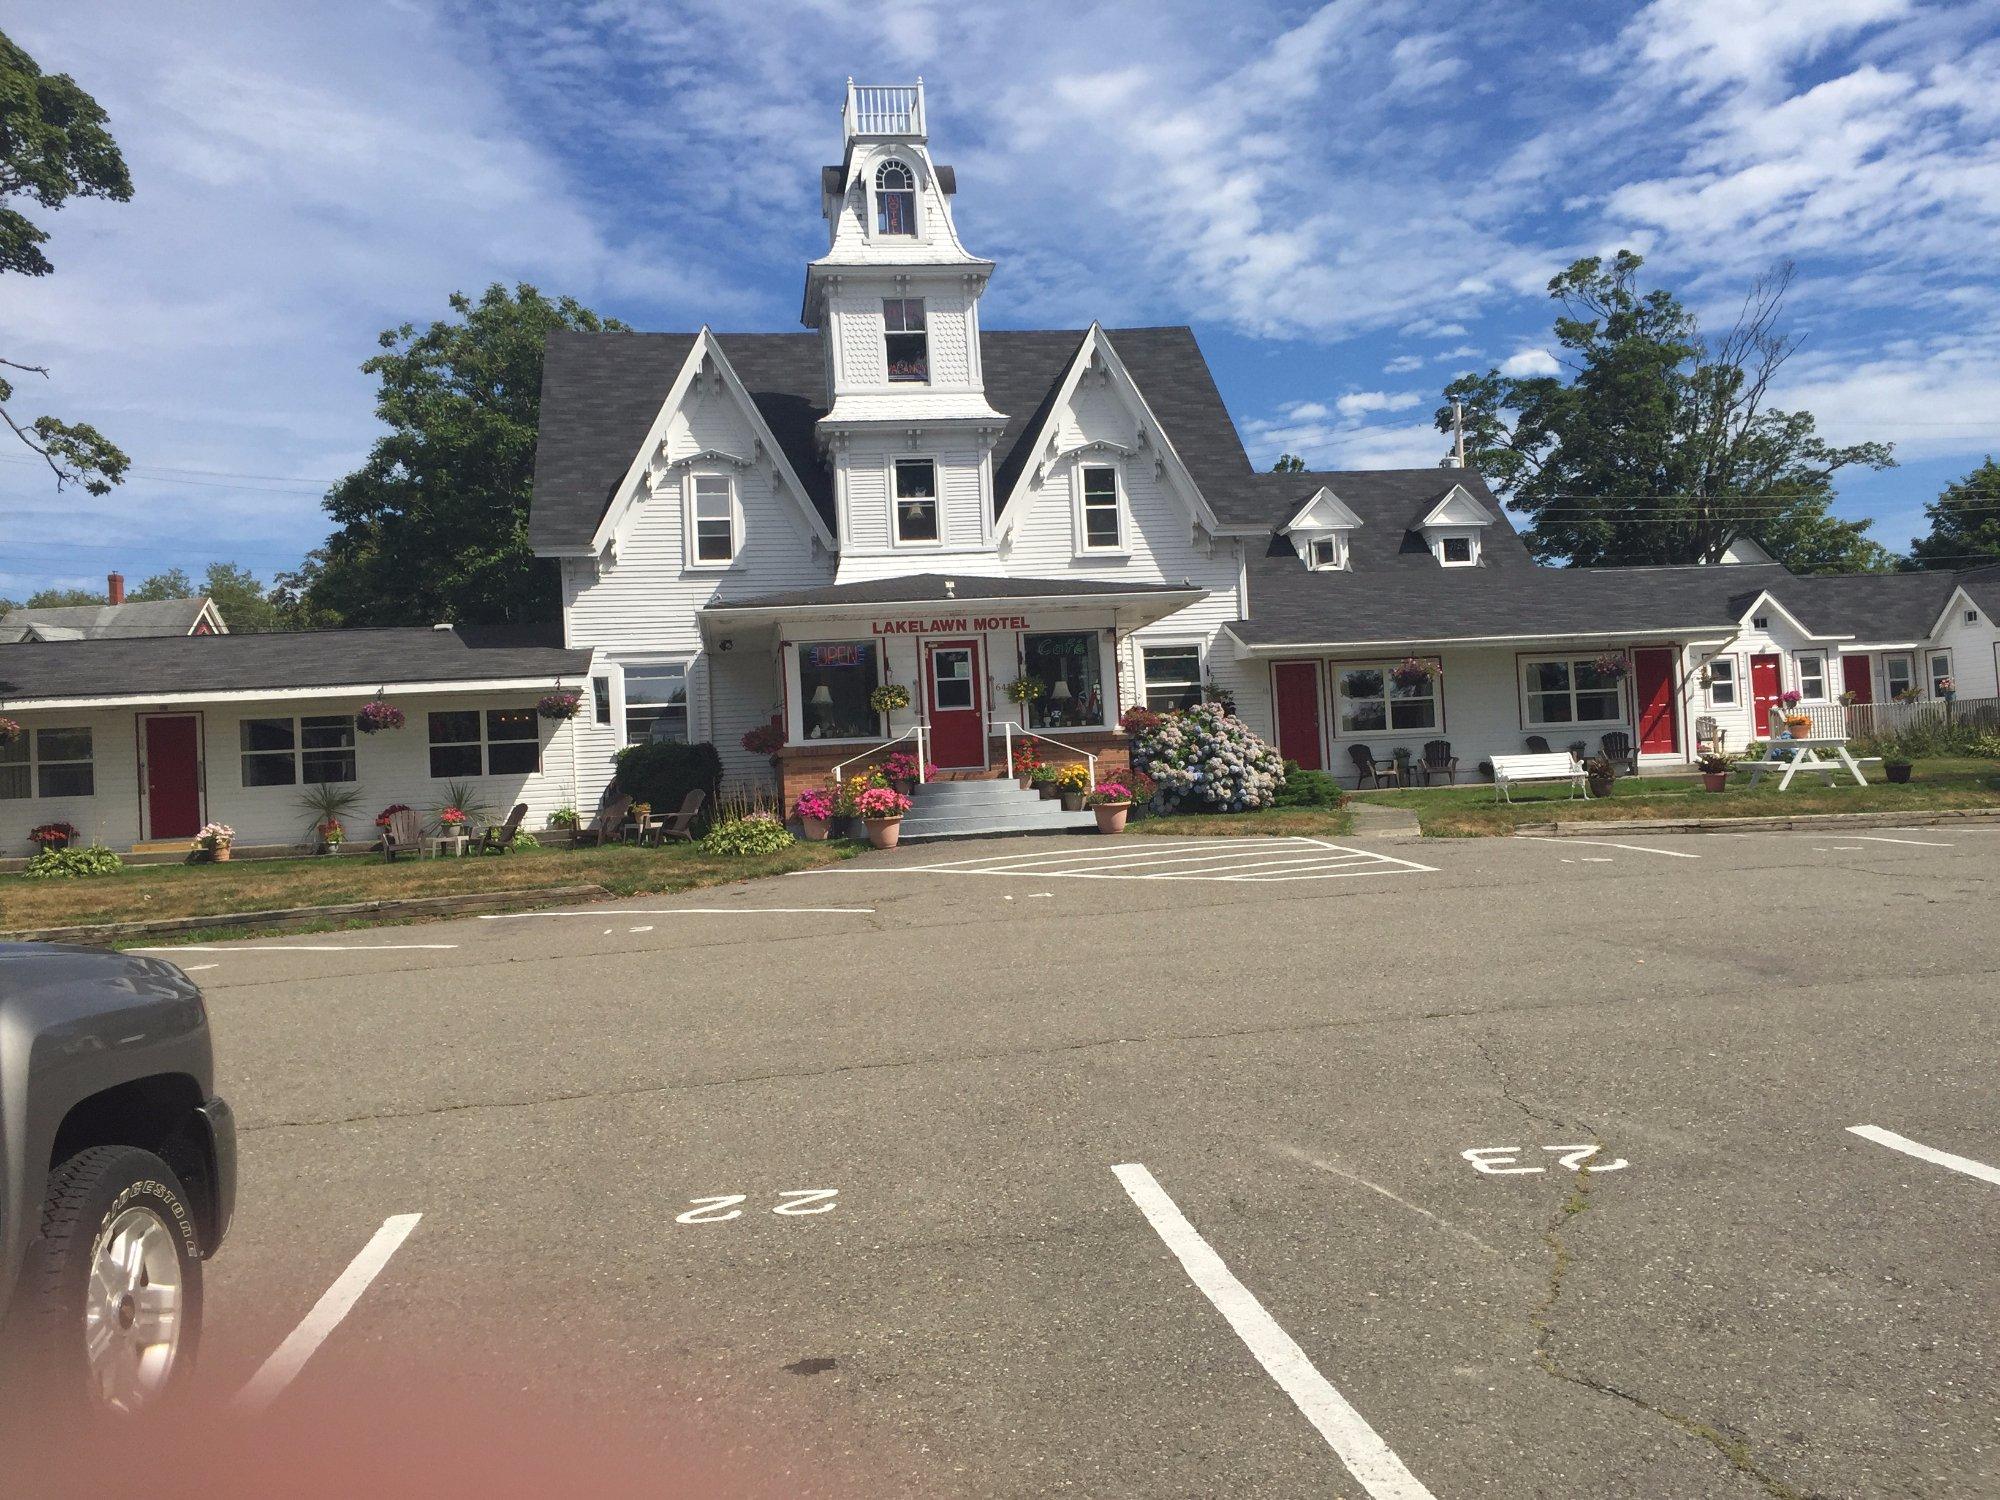 Lakelawn B&B Motel